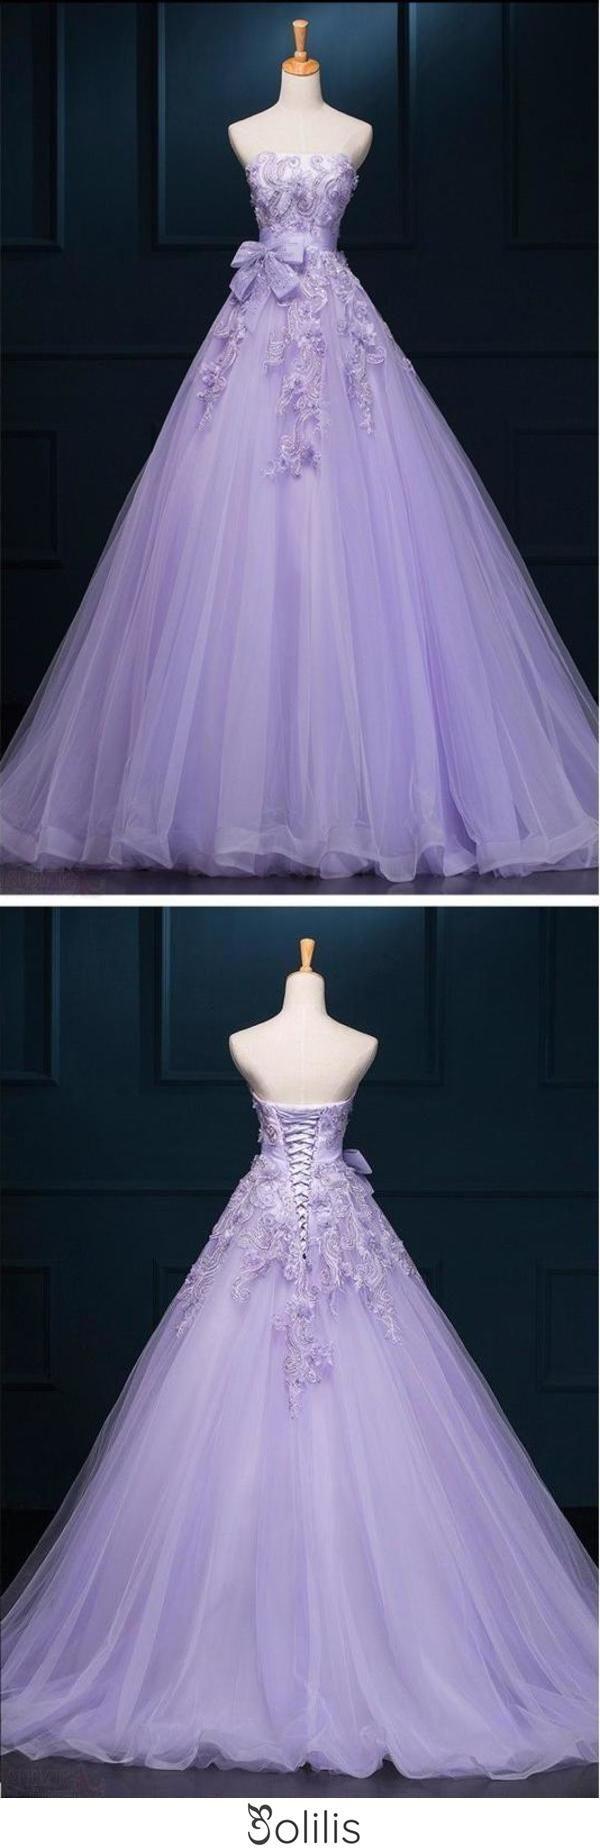 New Arrival Ball Gown Luxury Appliques Prom Dress Wedding Dresses  Jolilis